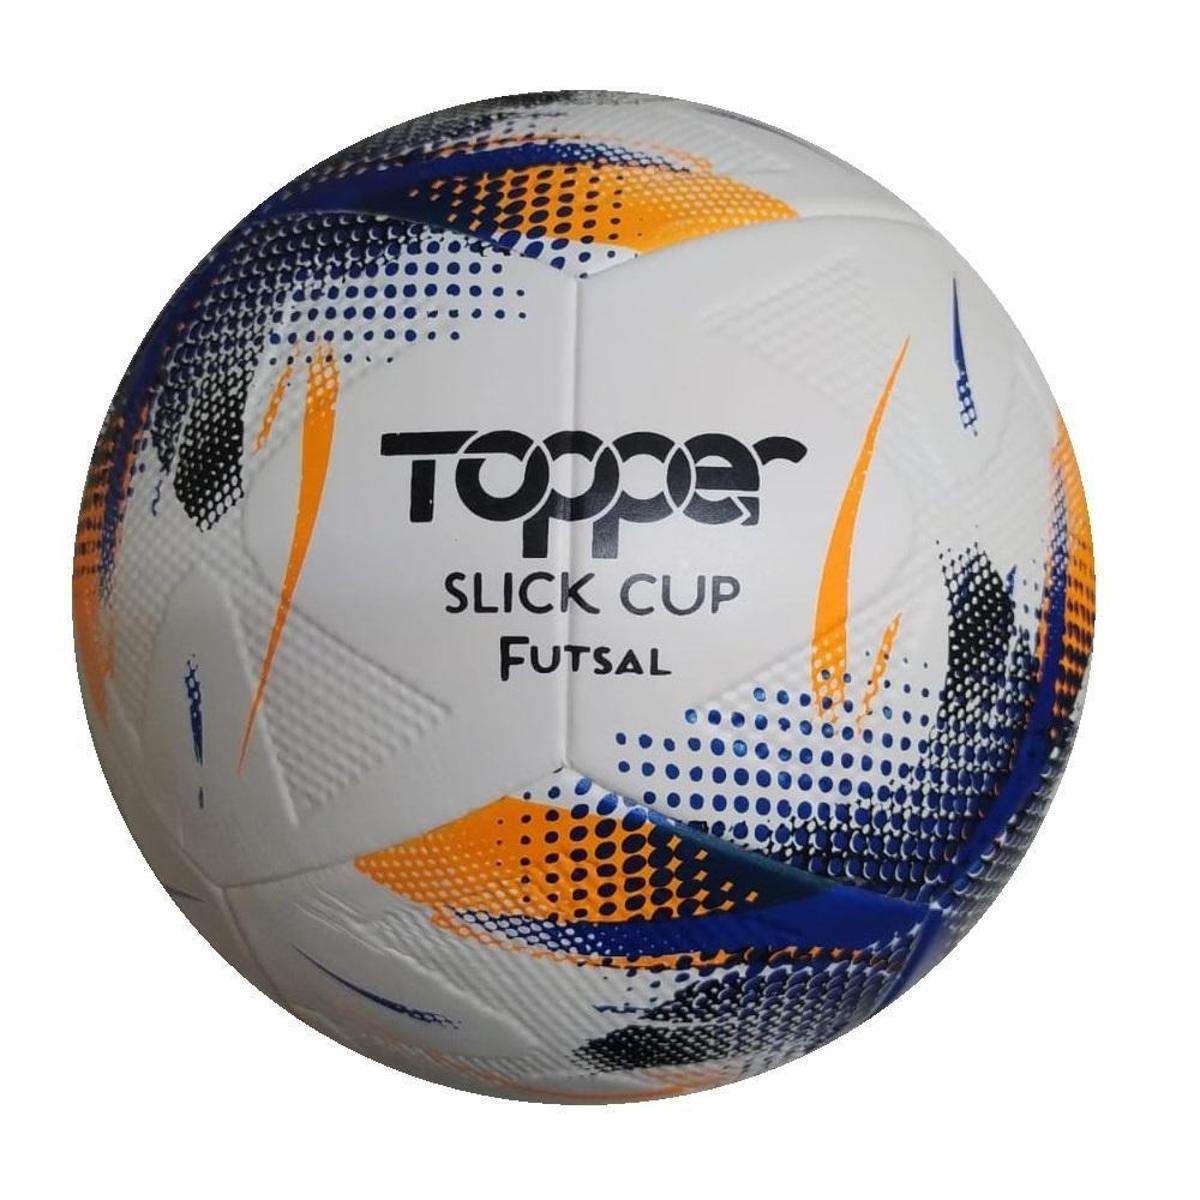 Bola Futsal Topper Slick Cup Oficial Original Profissional